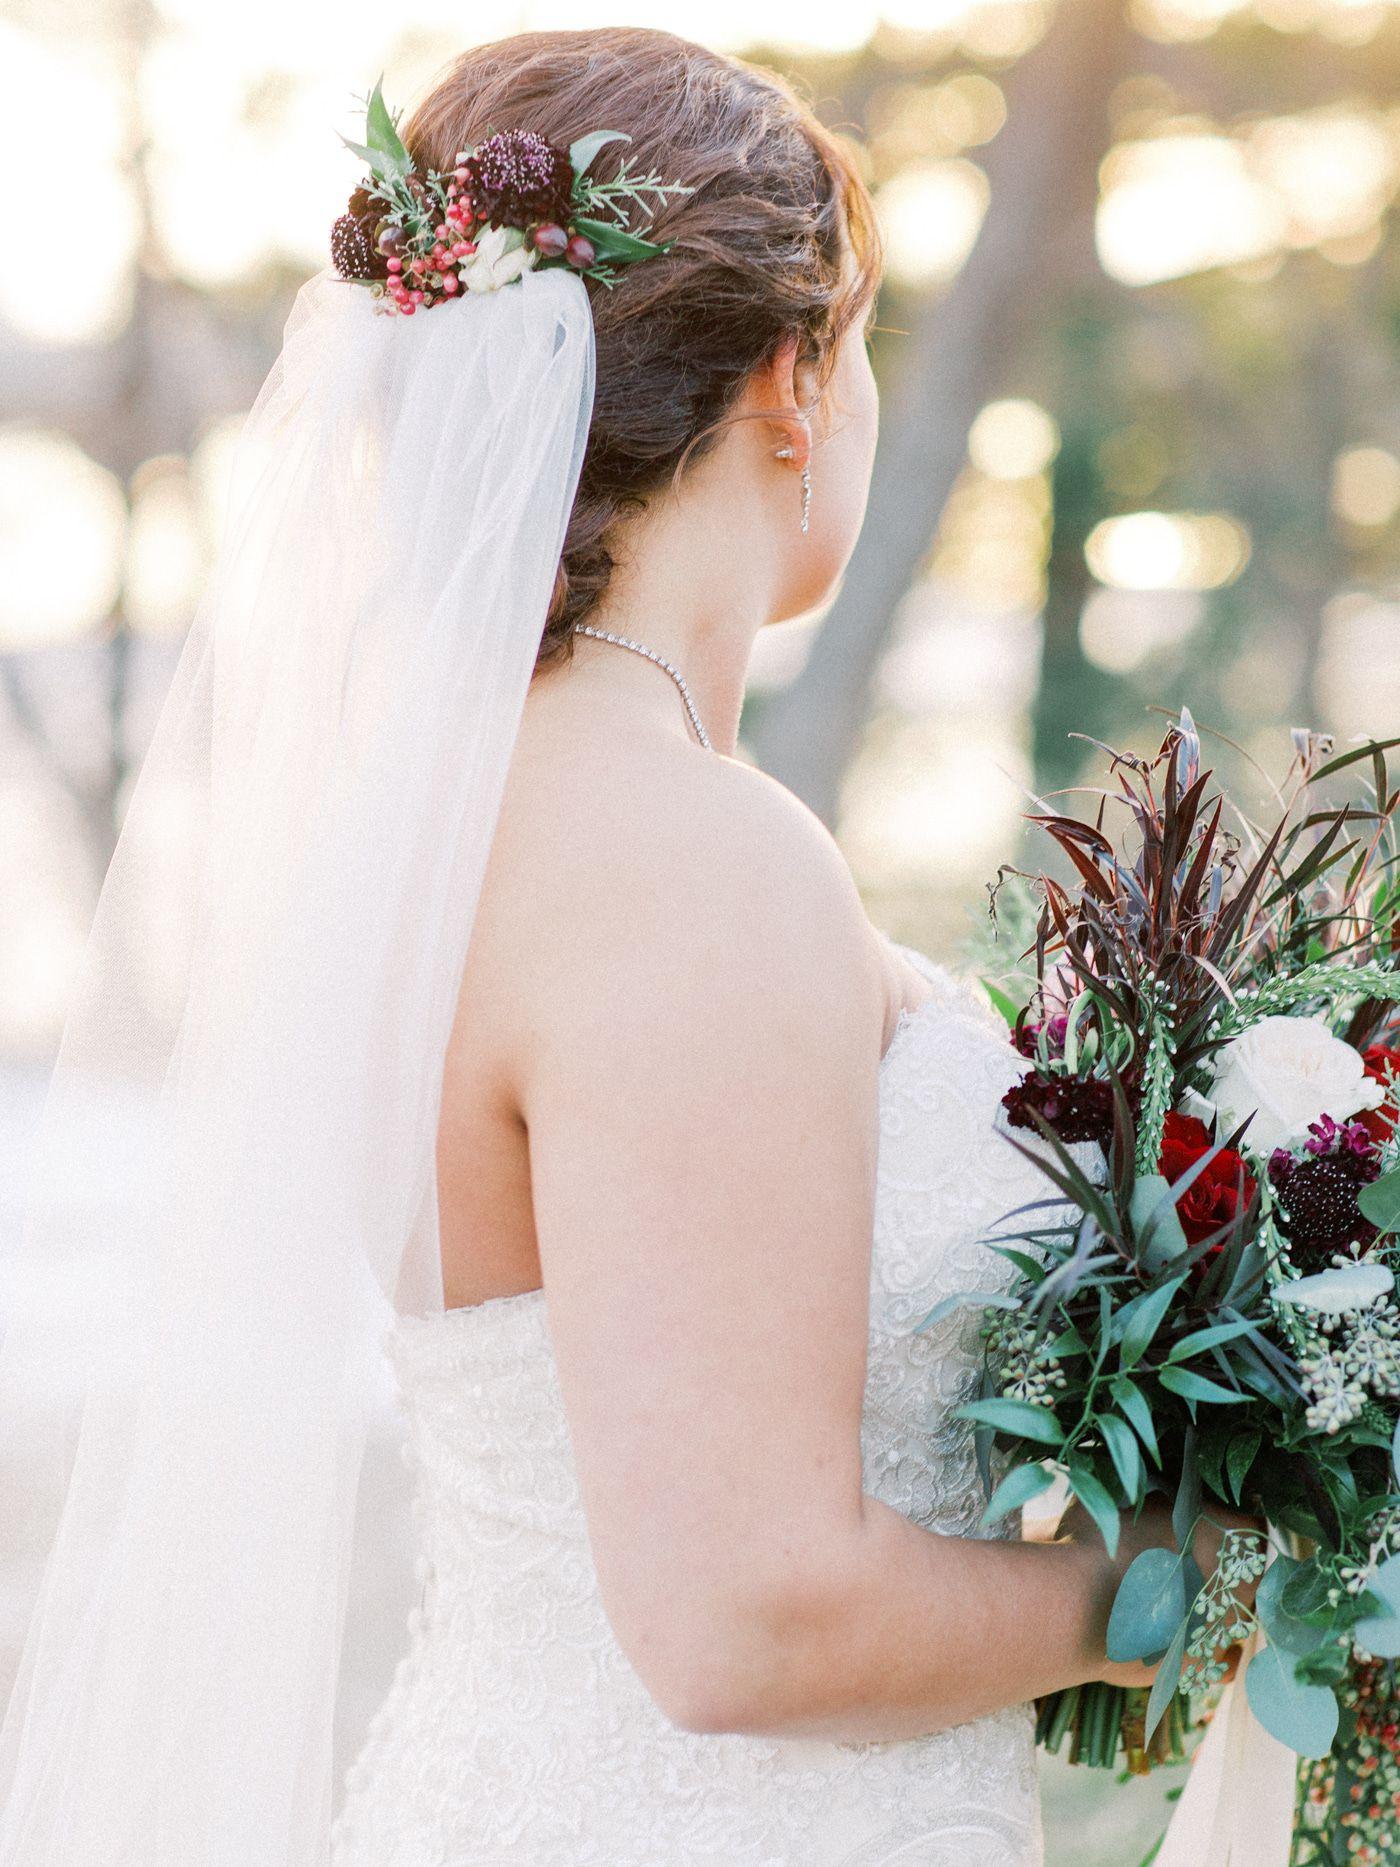 www.natashianicolephotography.com   Wedding dresses. Nature inspiration. Nature design